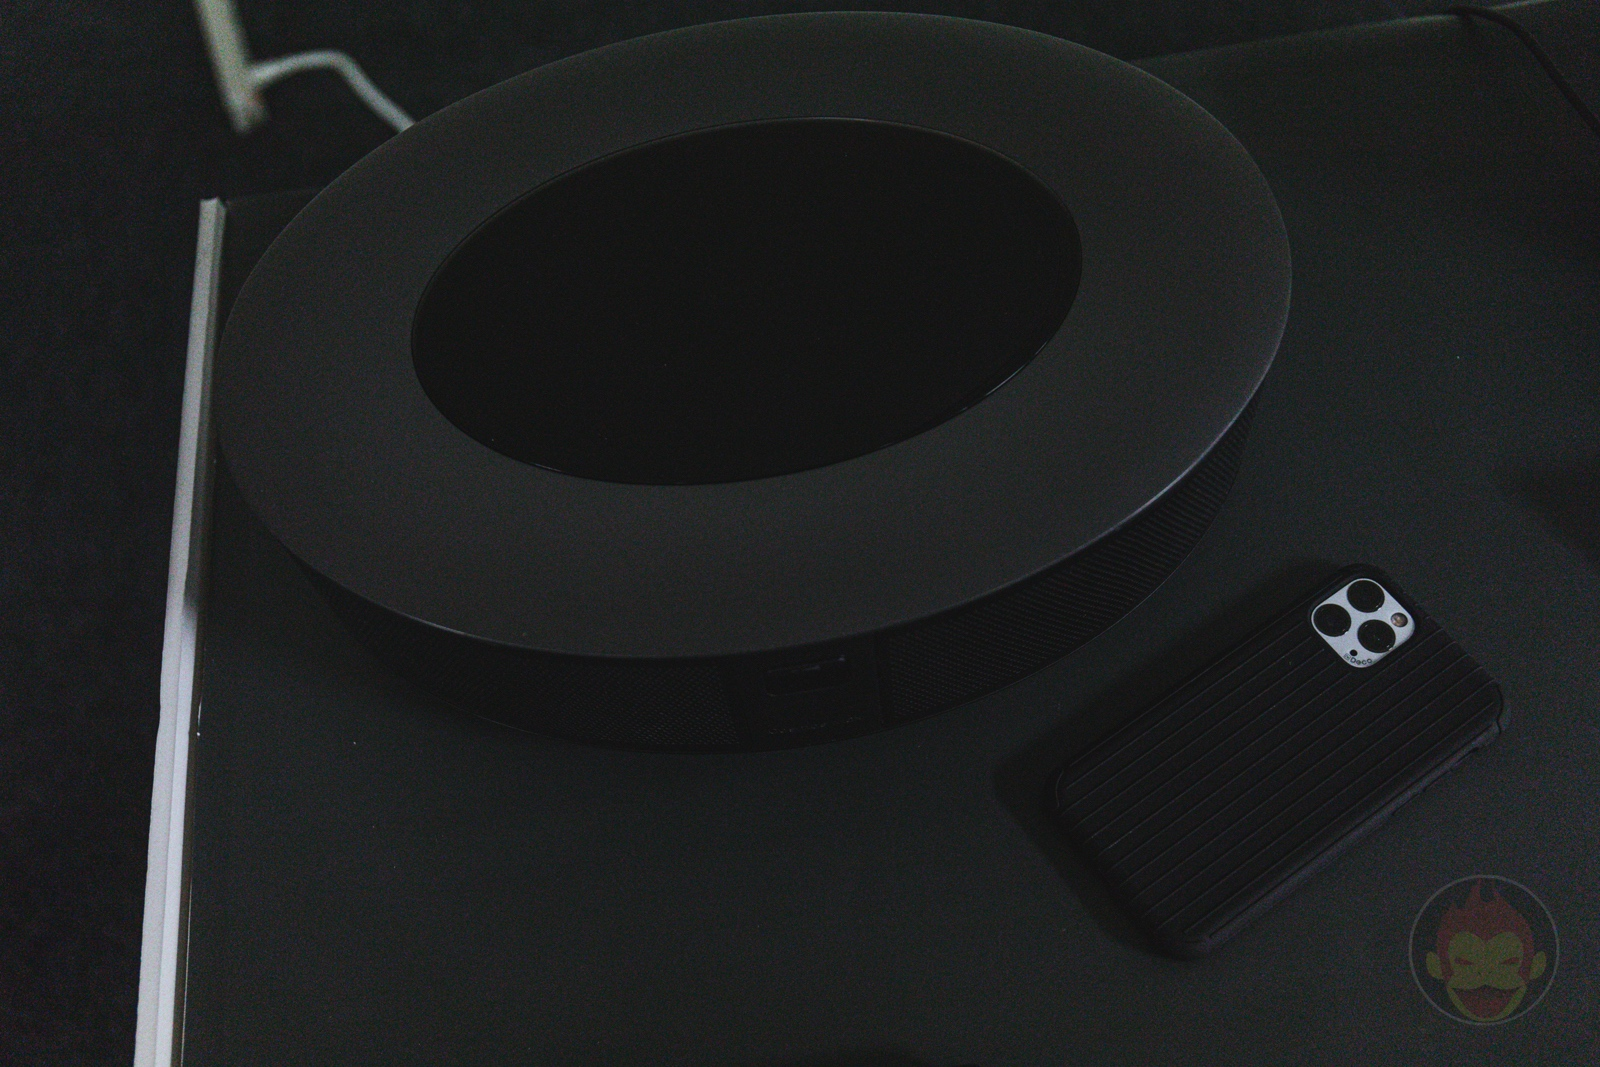 Anker-Nebula-Cosmos-Crowdfunding-Expo-2020-Spring-05.jpg